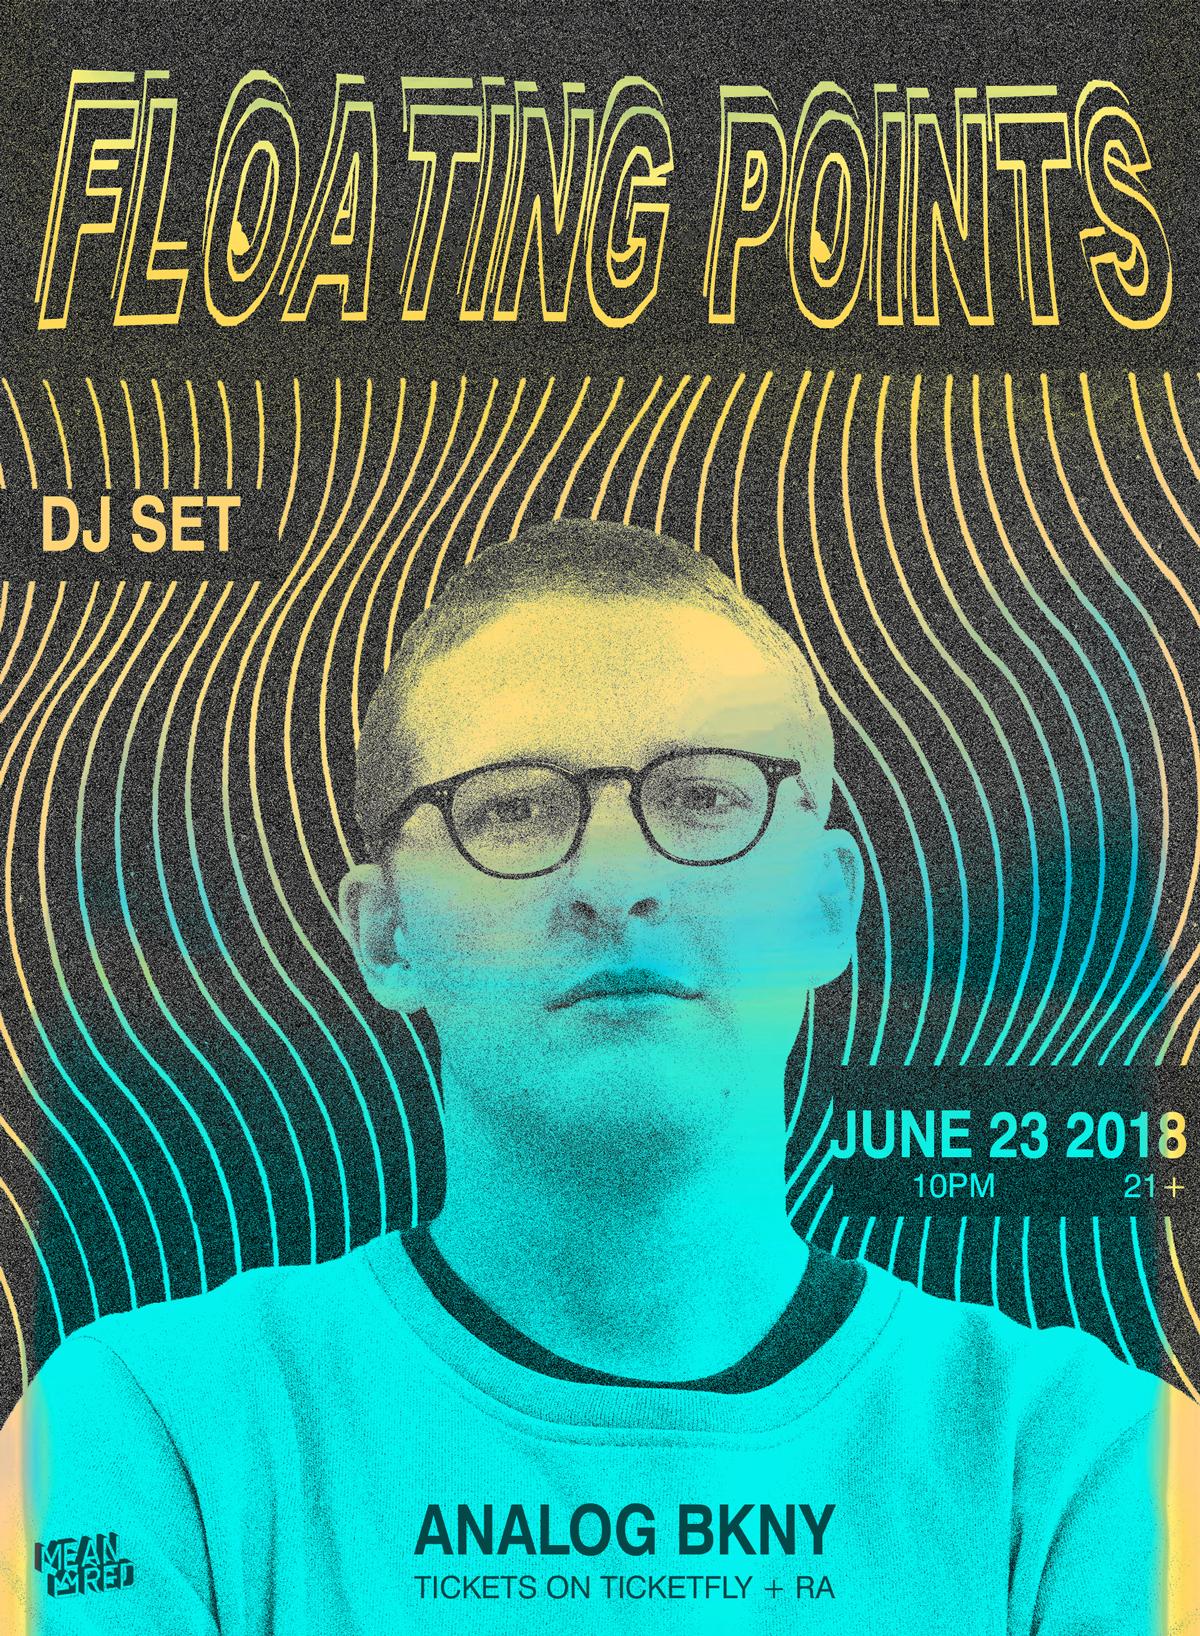 062318_Floating-Points_Flyer.jpg